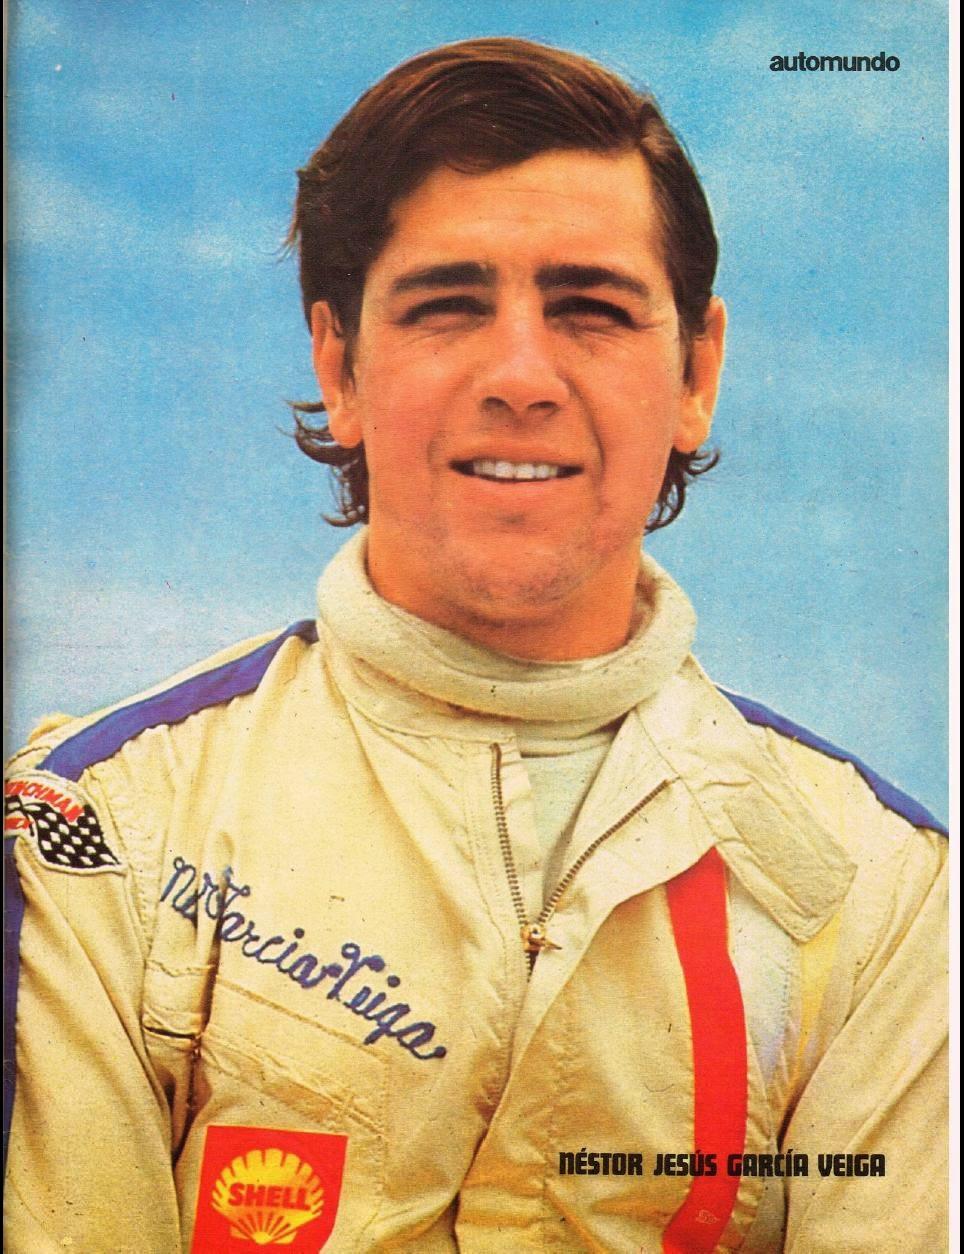 sport prototipo argentino NESTOR JESUS GARCIA VEIGACAMPEON 1970